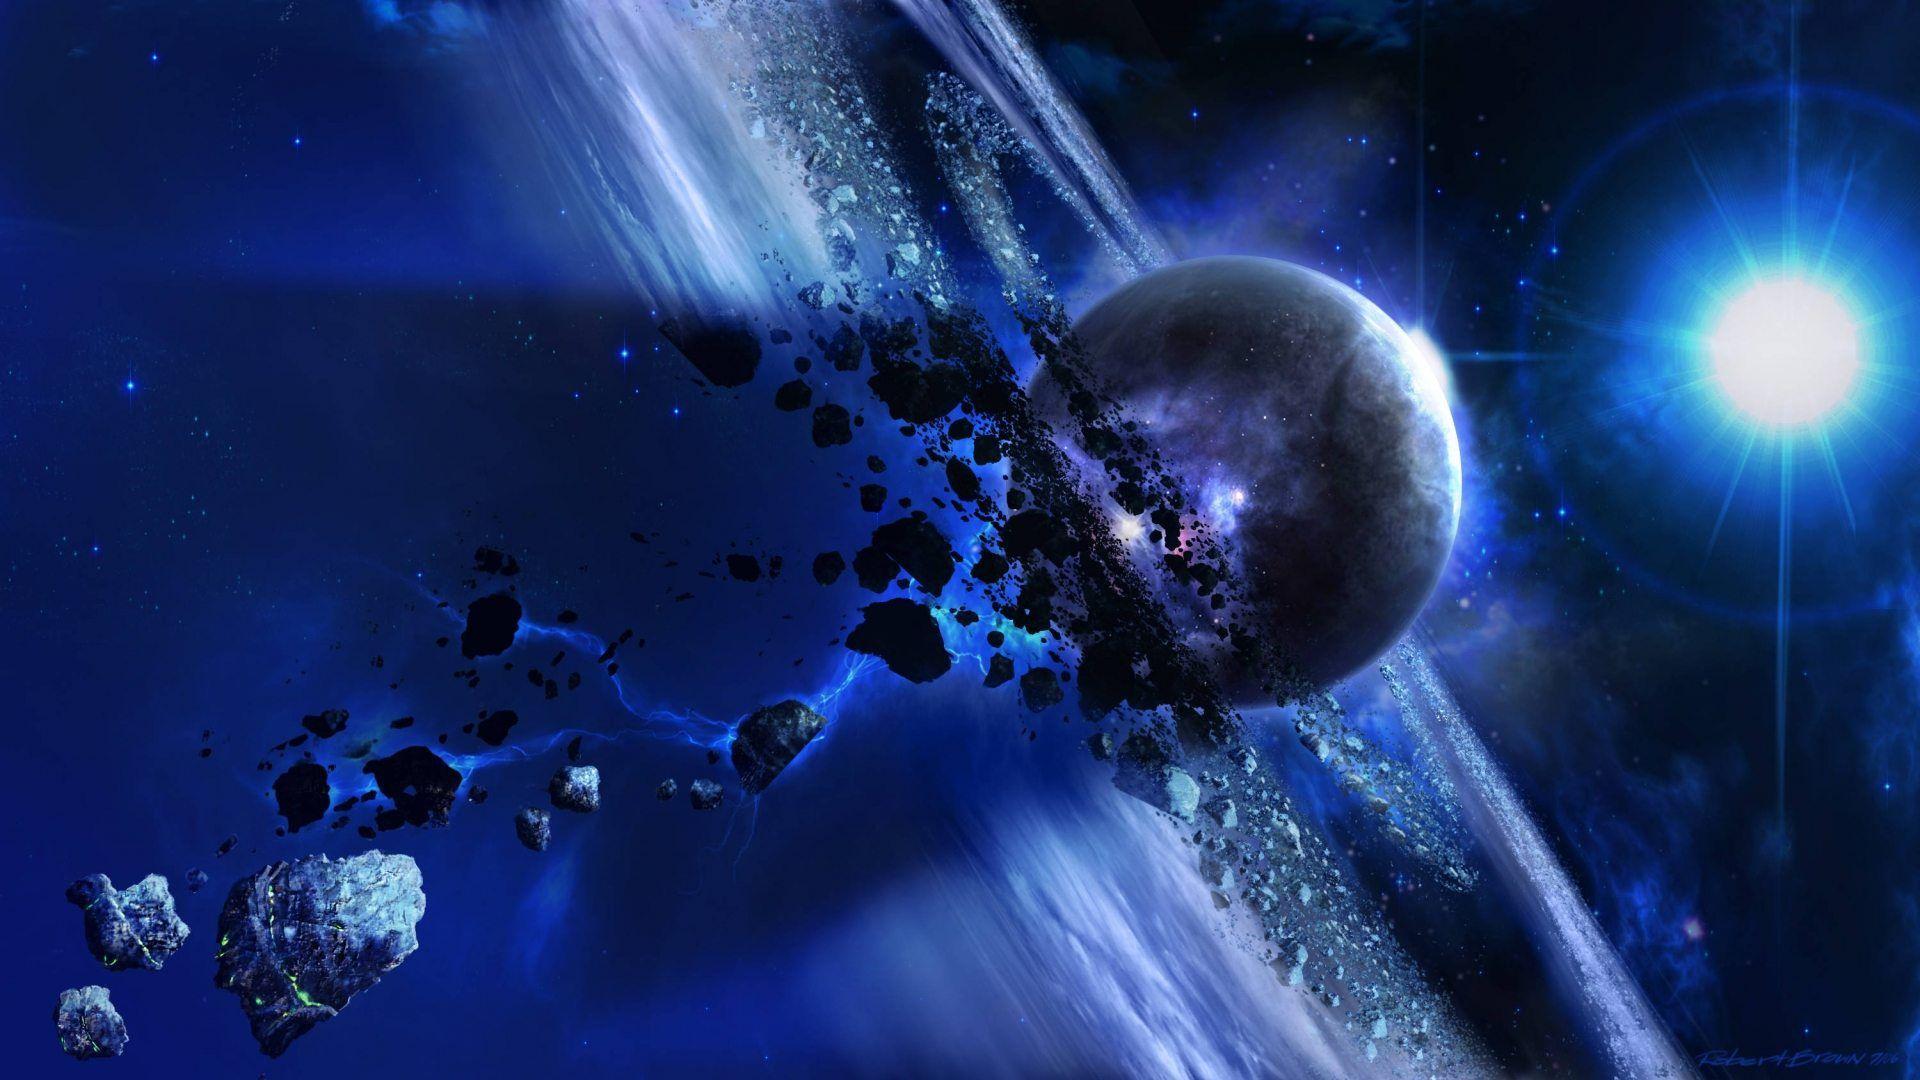 Universe Desktop Wallpapers Top Free Universe Desktop